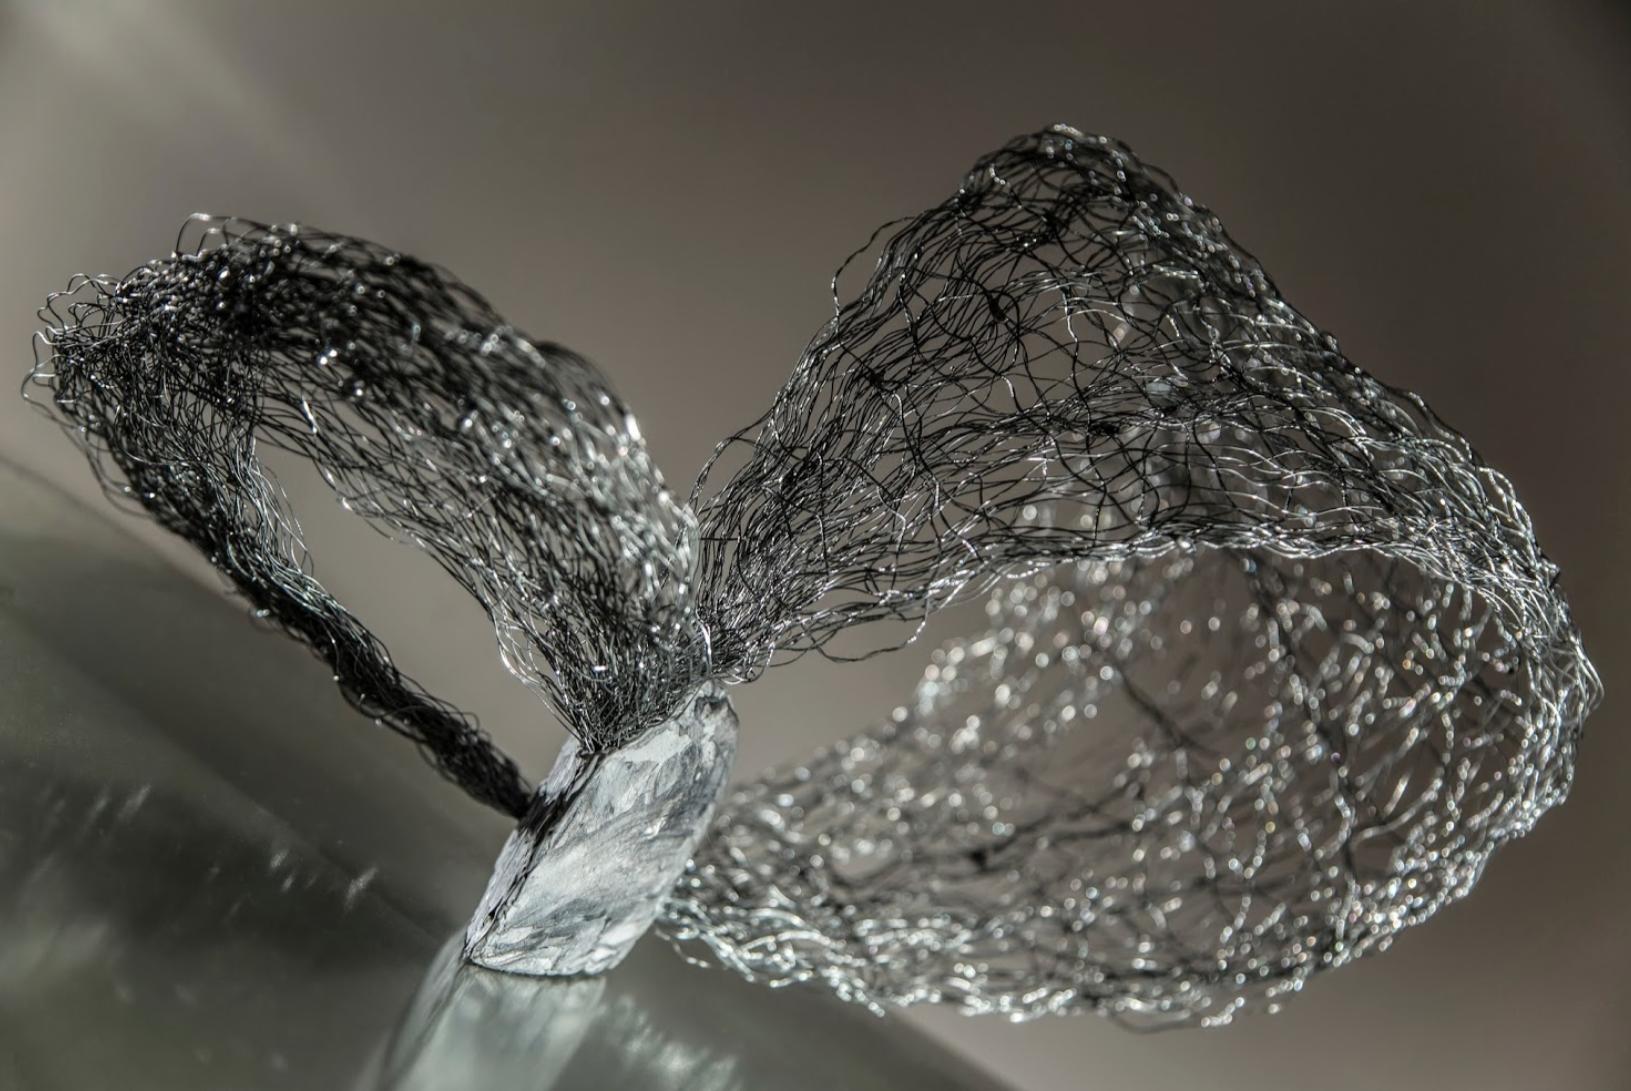 Maja Taneva – Metal wire sculptures (Macedonia)